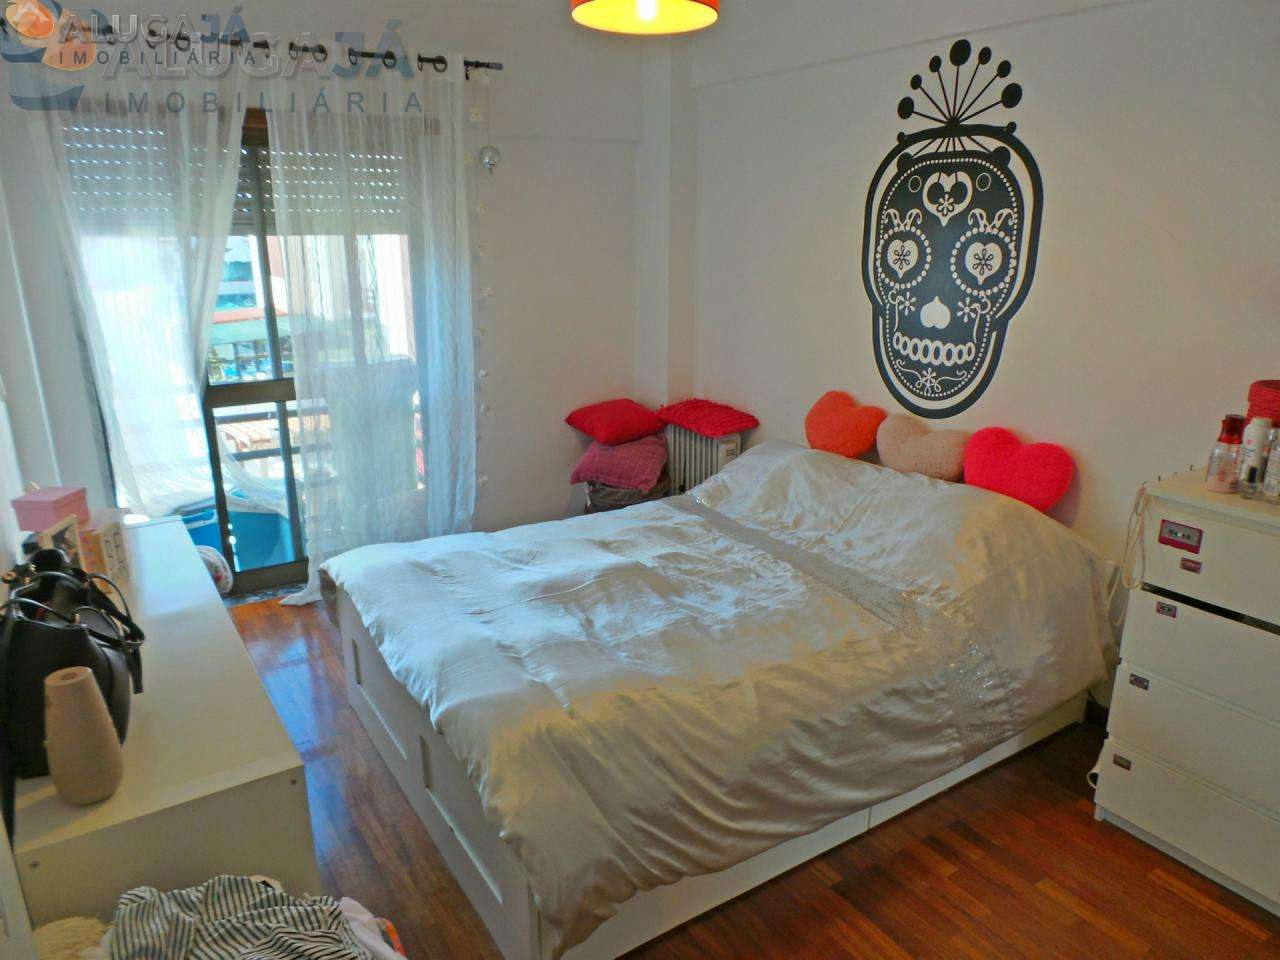 Apartamento para comprar, Vialonga, Vila Franca de Xira, Lisboa - Foto 17